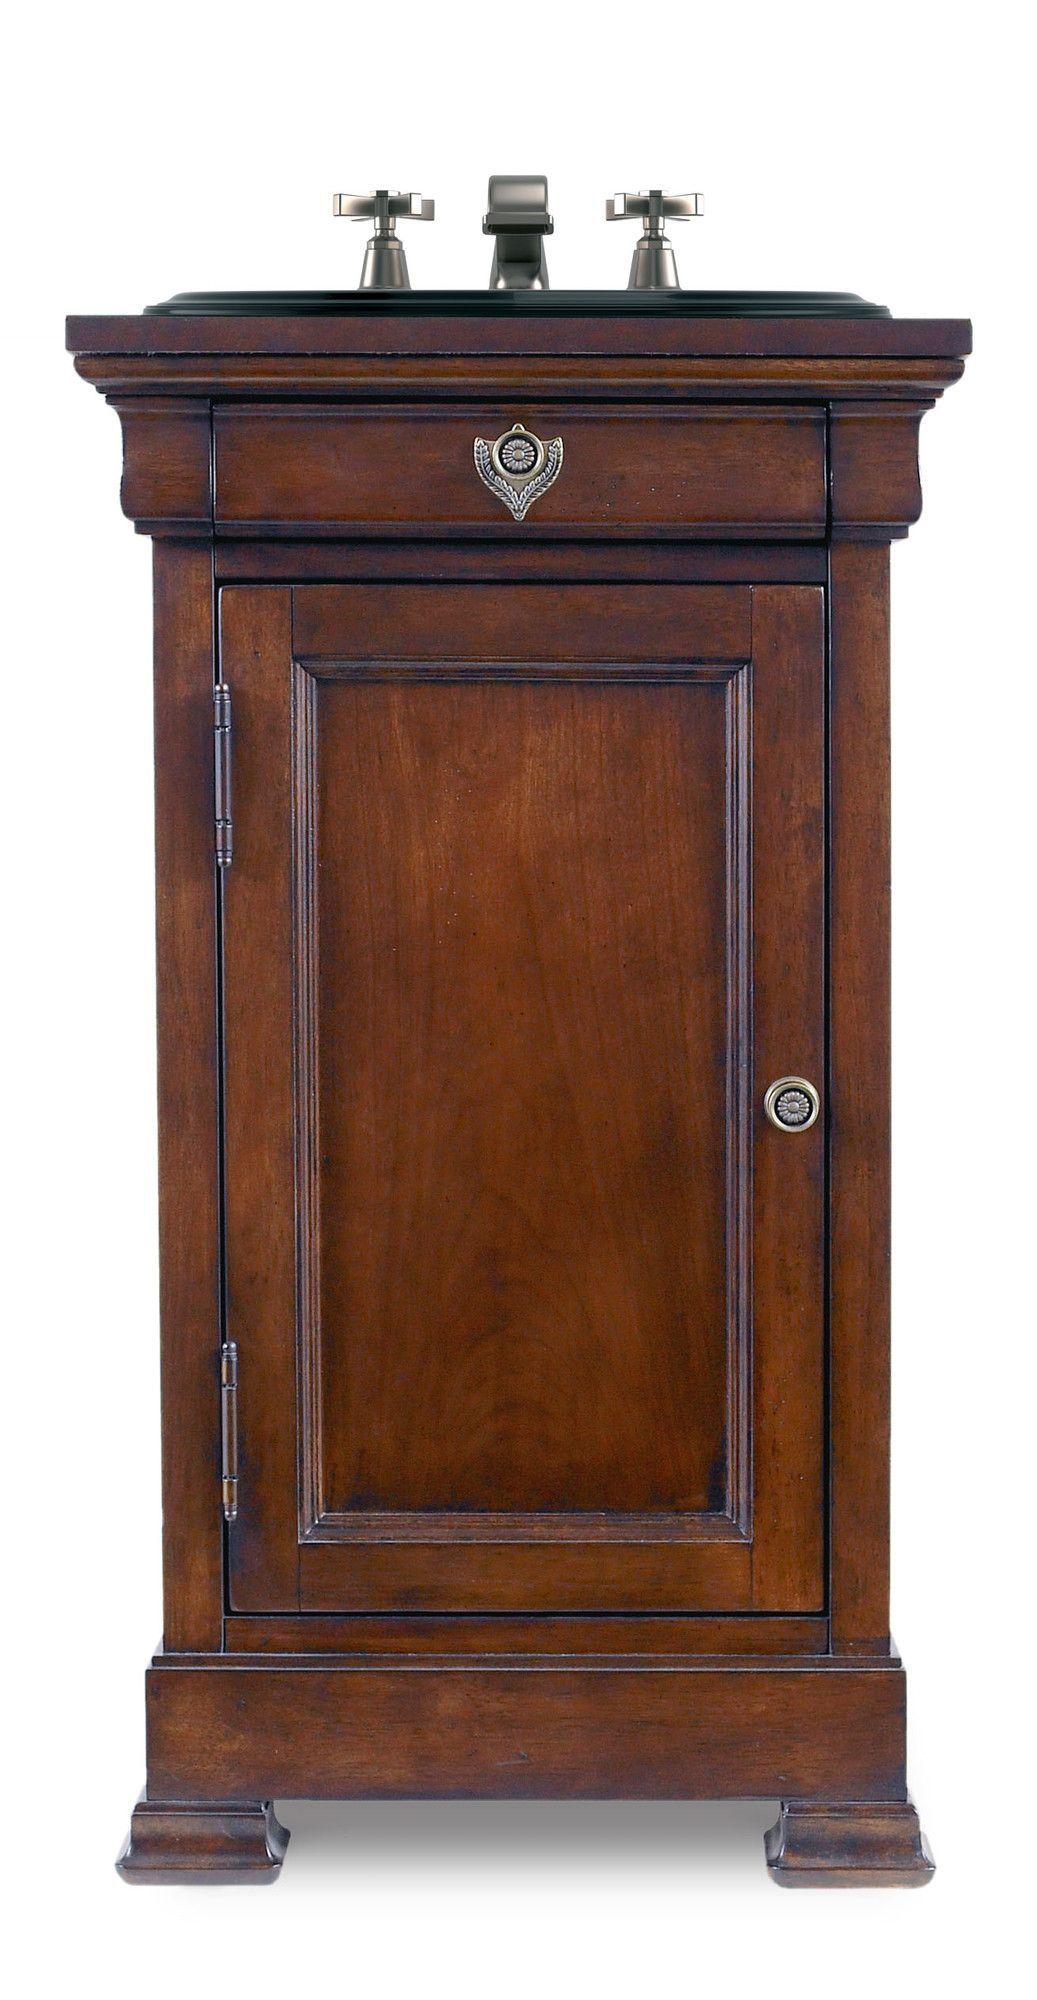 Photo Gallery On Website Providence Double Cabinet Vanity Base Second EmpireBathroom